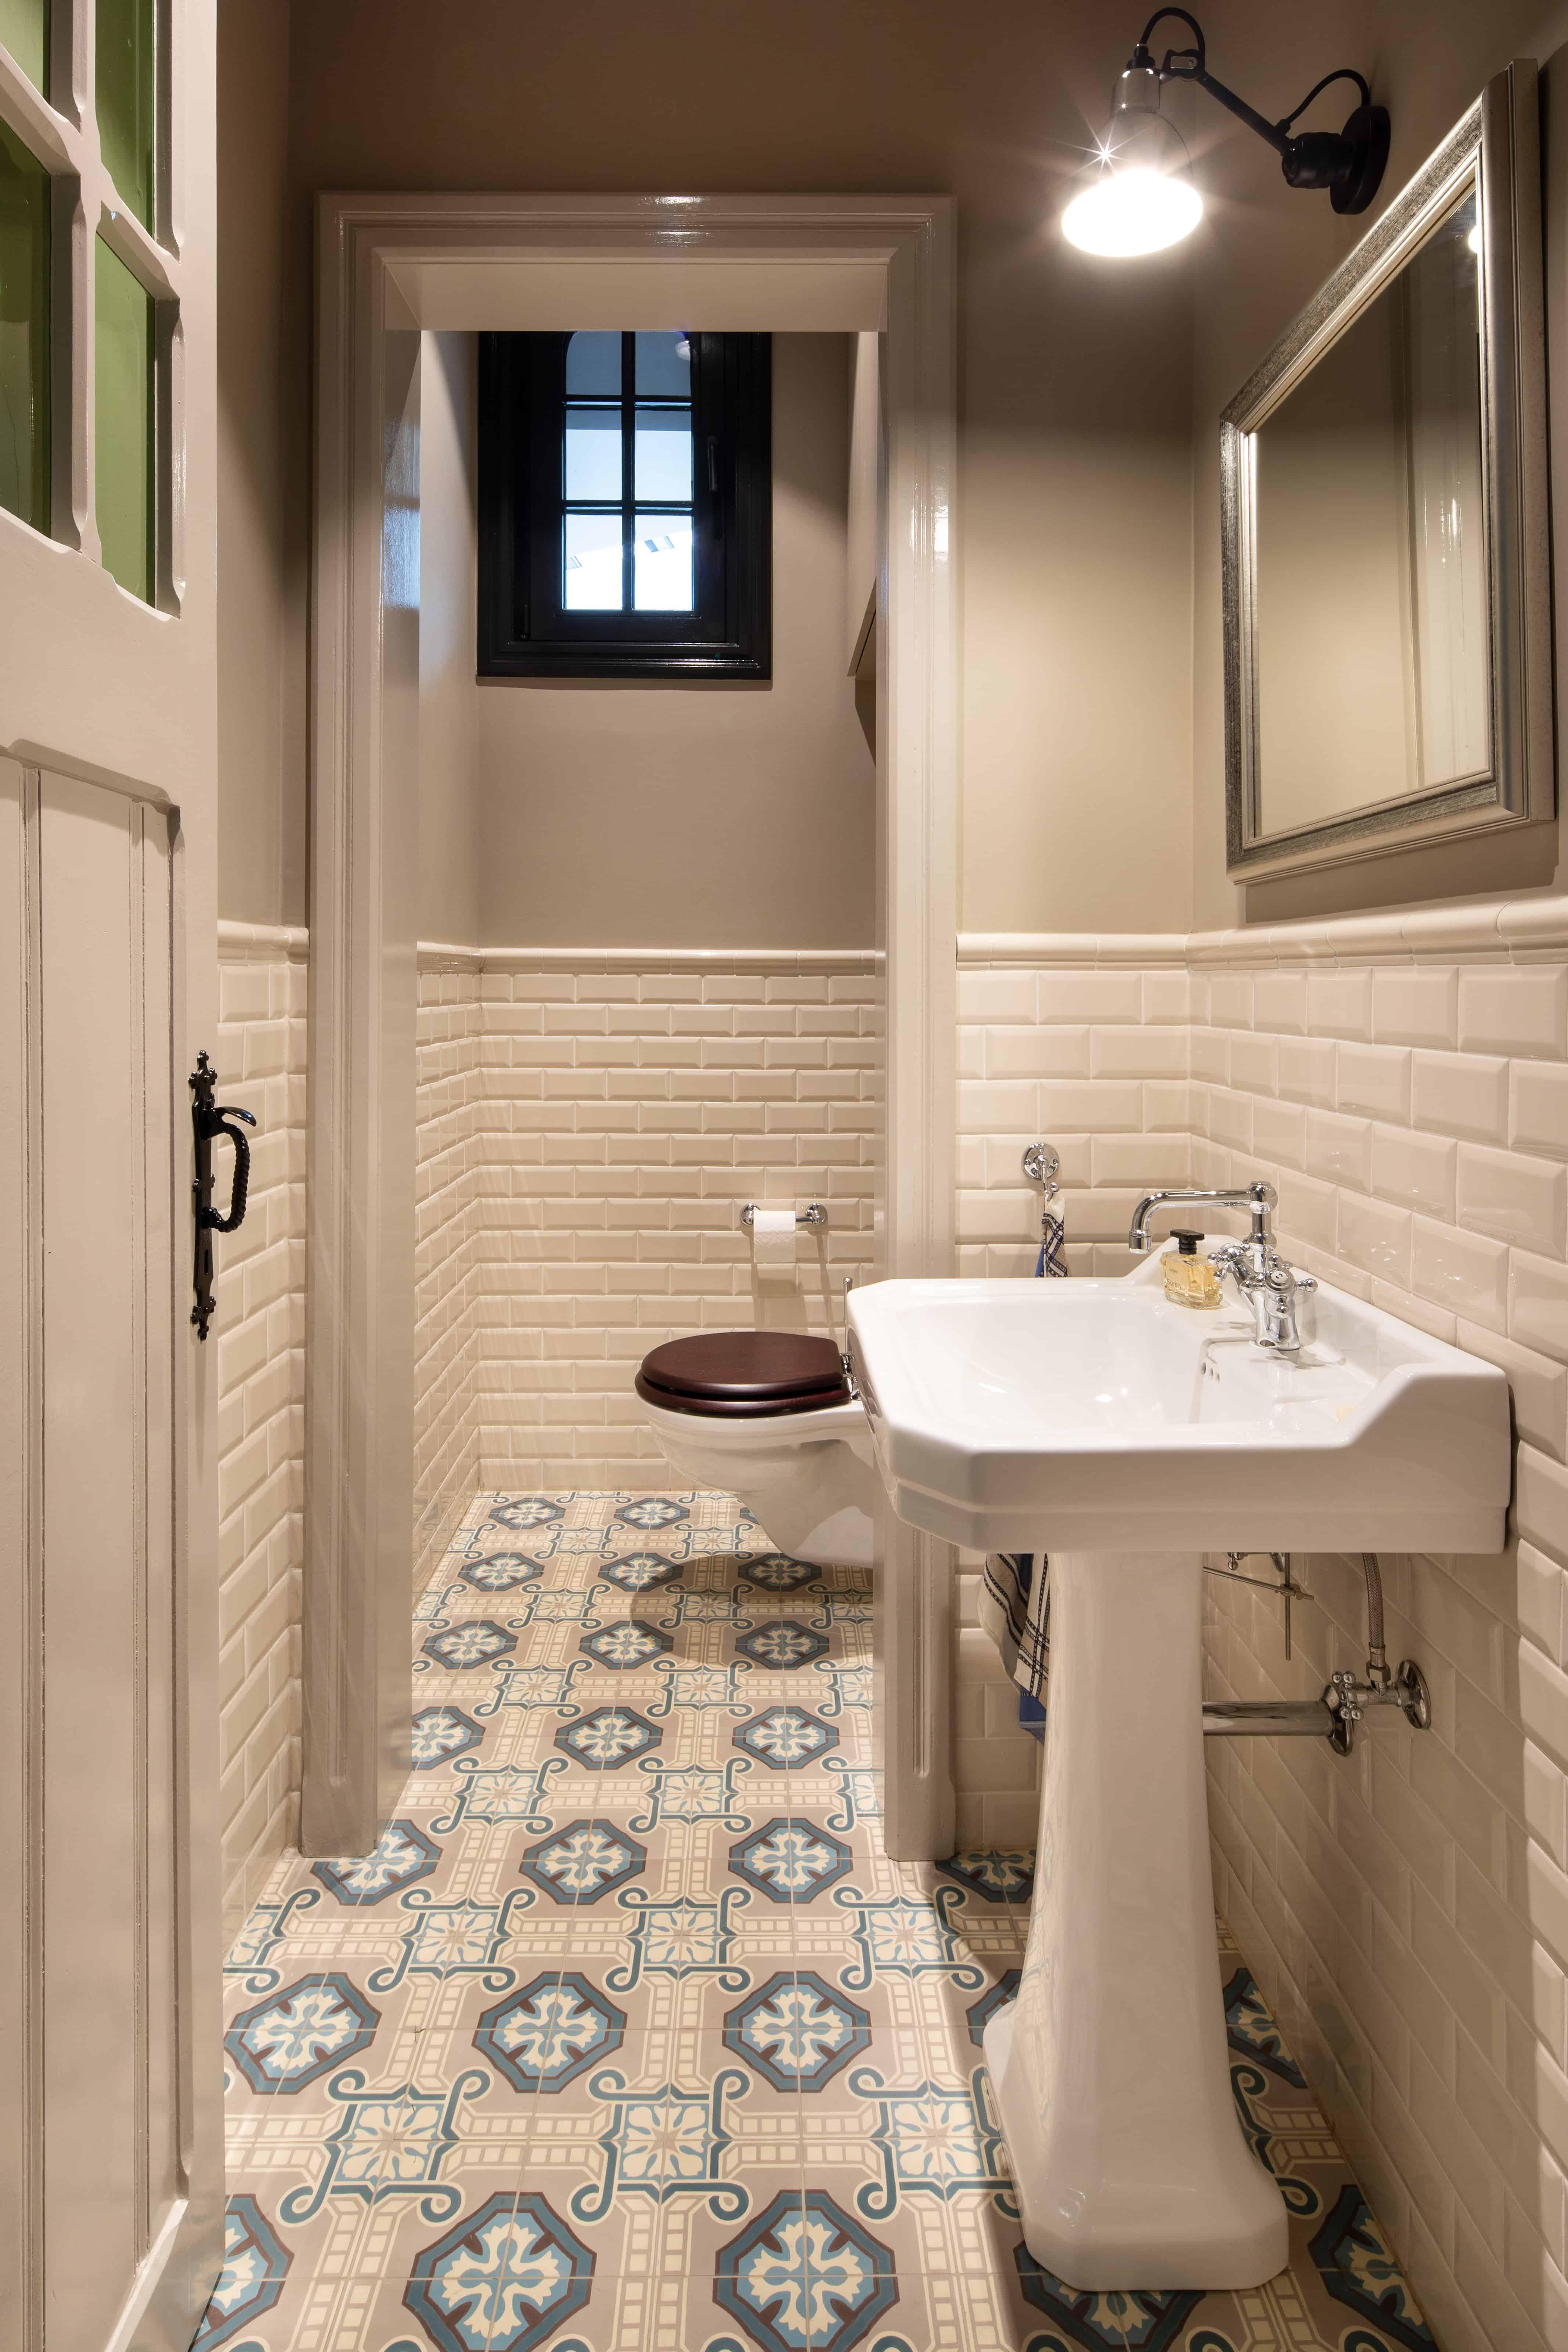 Badkamer met tegels met retromotief - Oostende